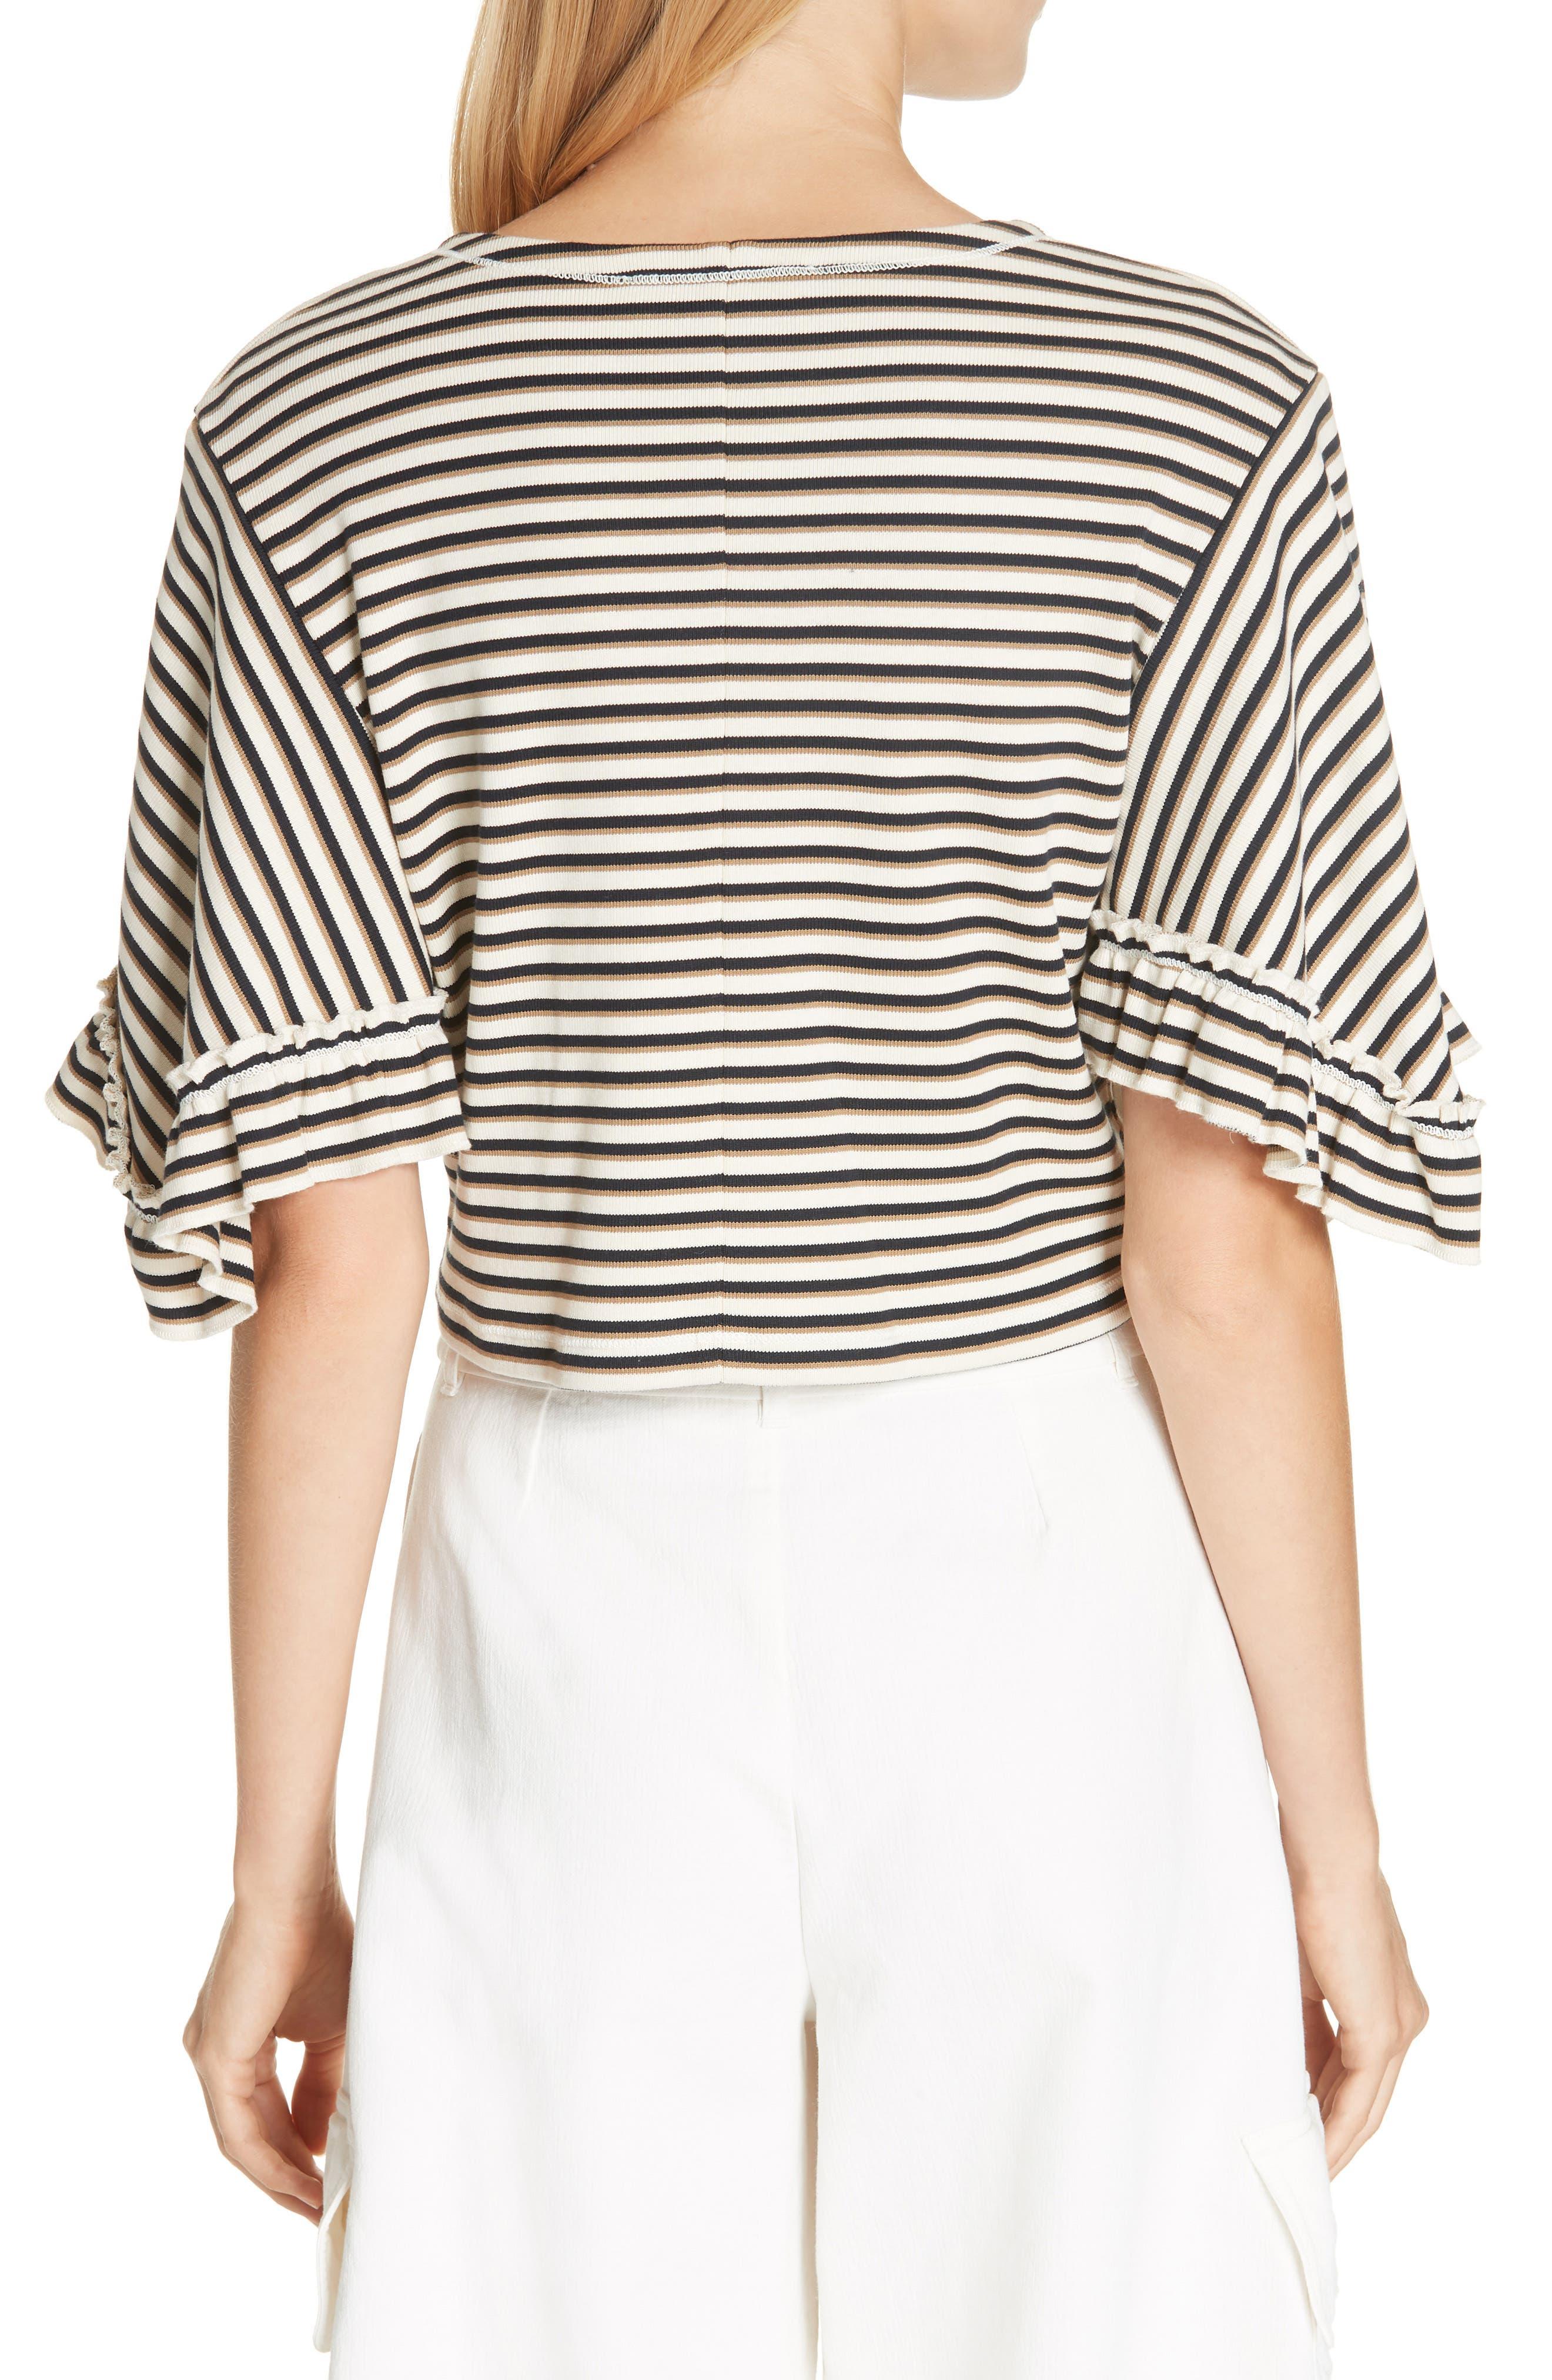 Stripe Top,                             Alternate thumbnail 2, color,                             WHITE - BEIGE 1